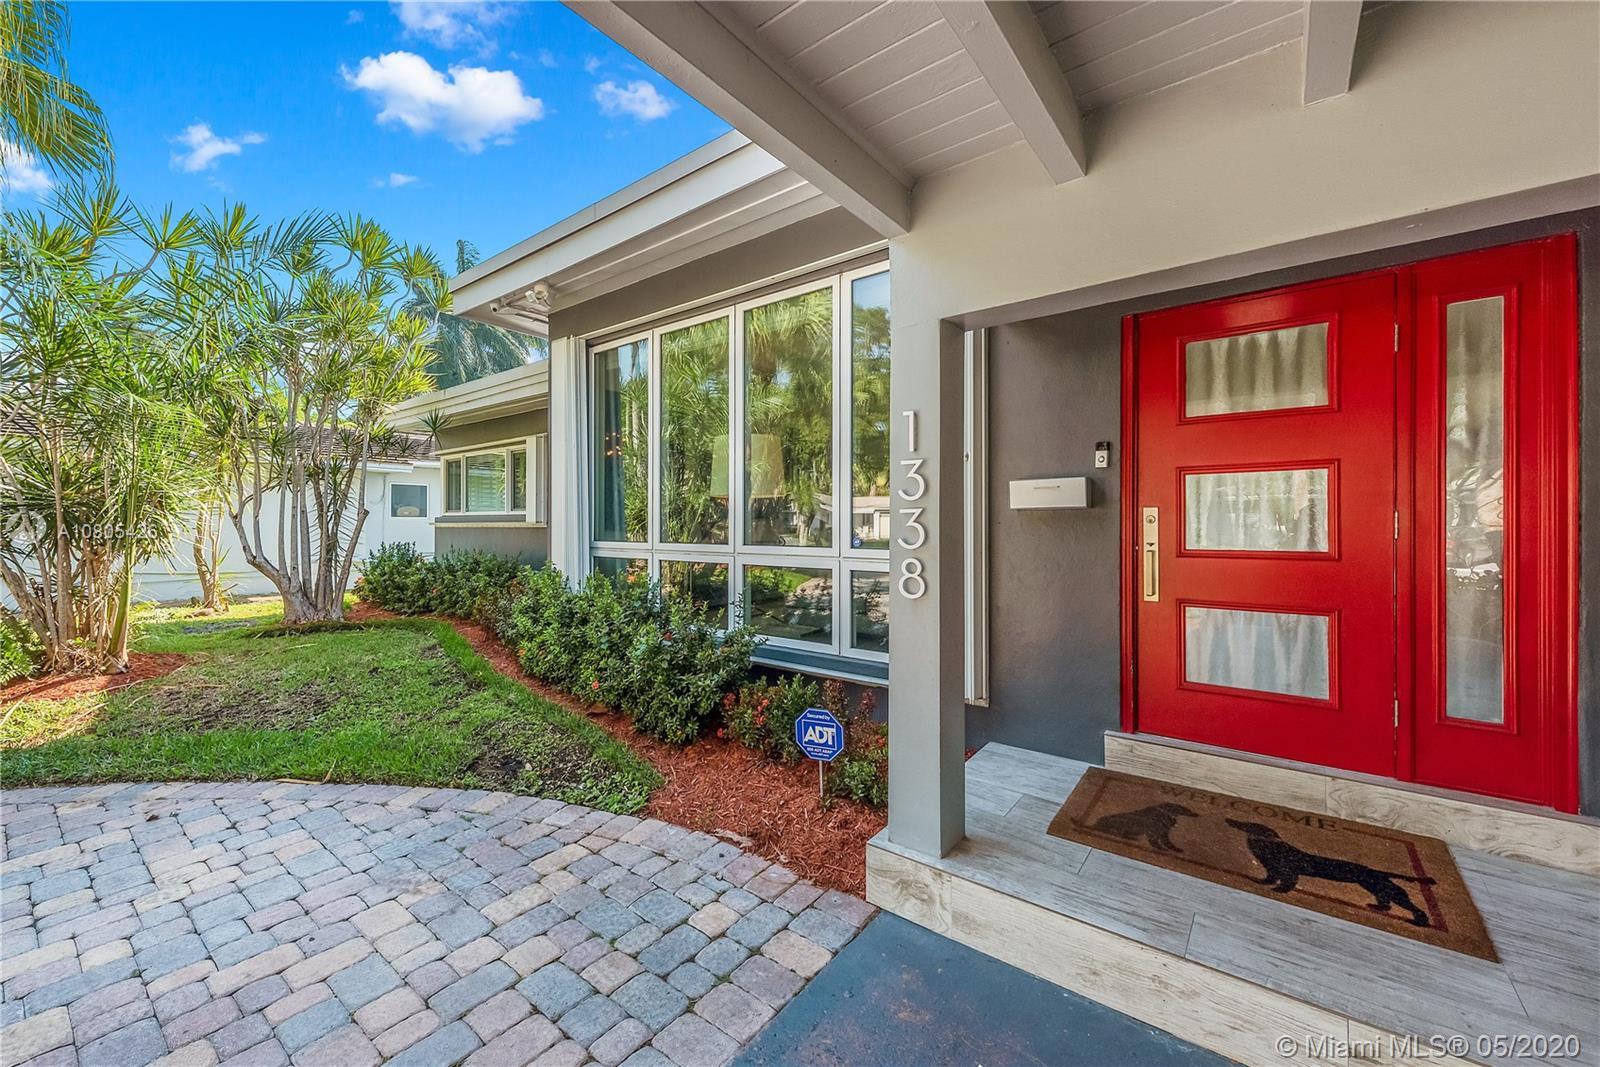 1338 Van Buren St - Hollywood, Florida